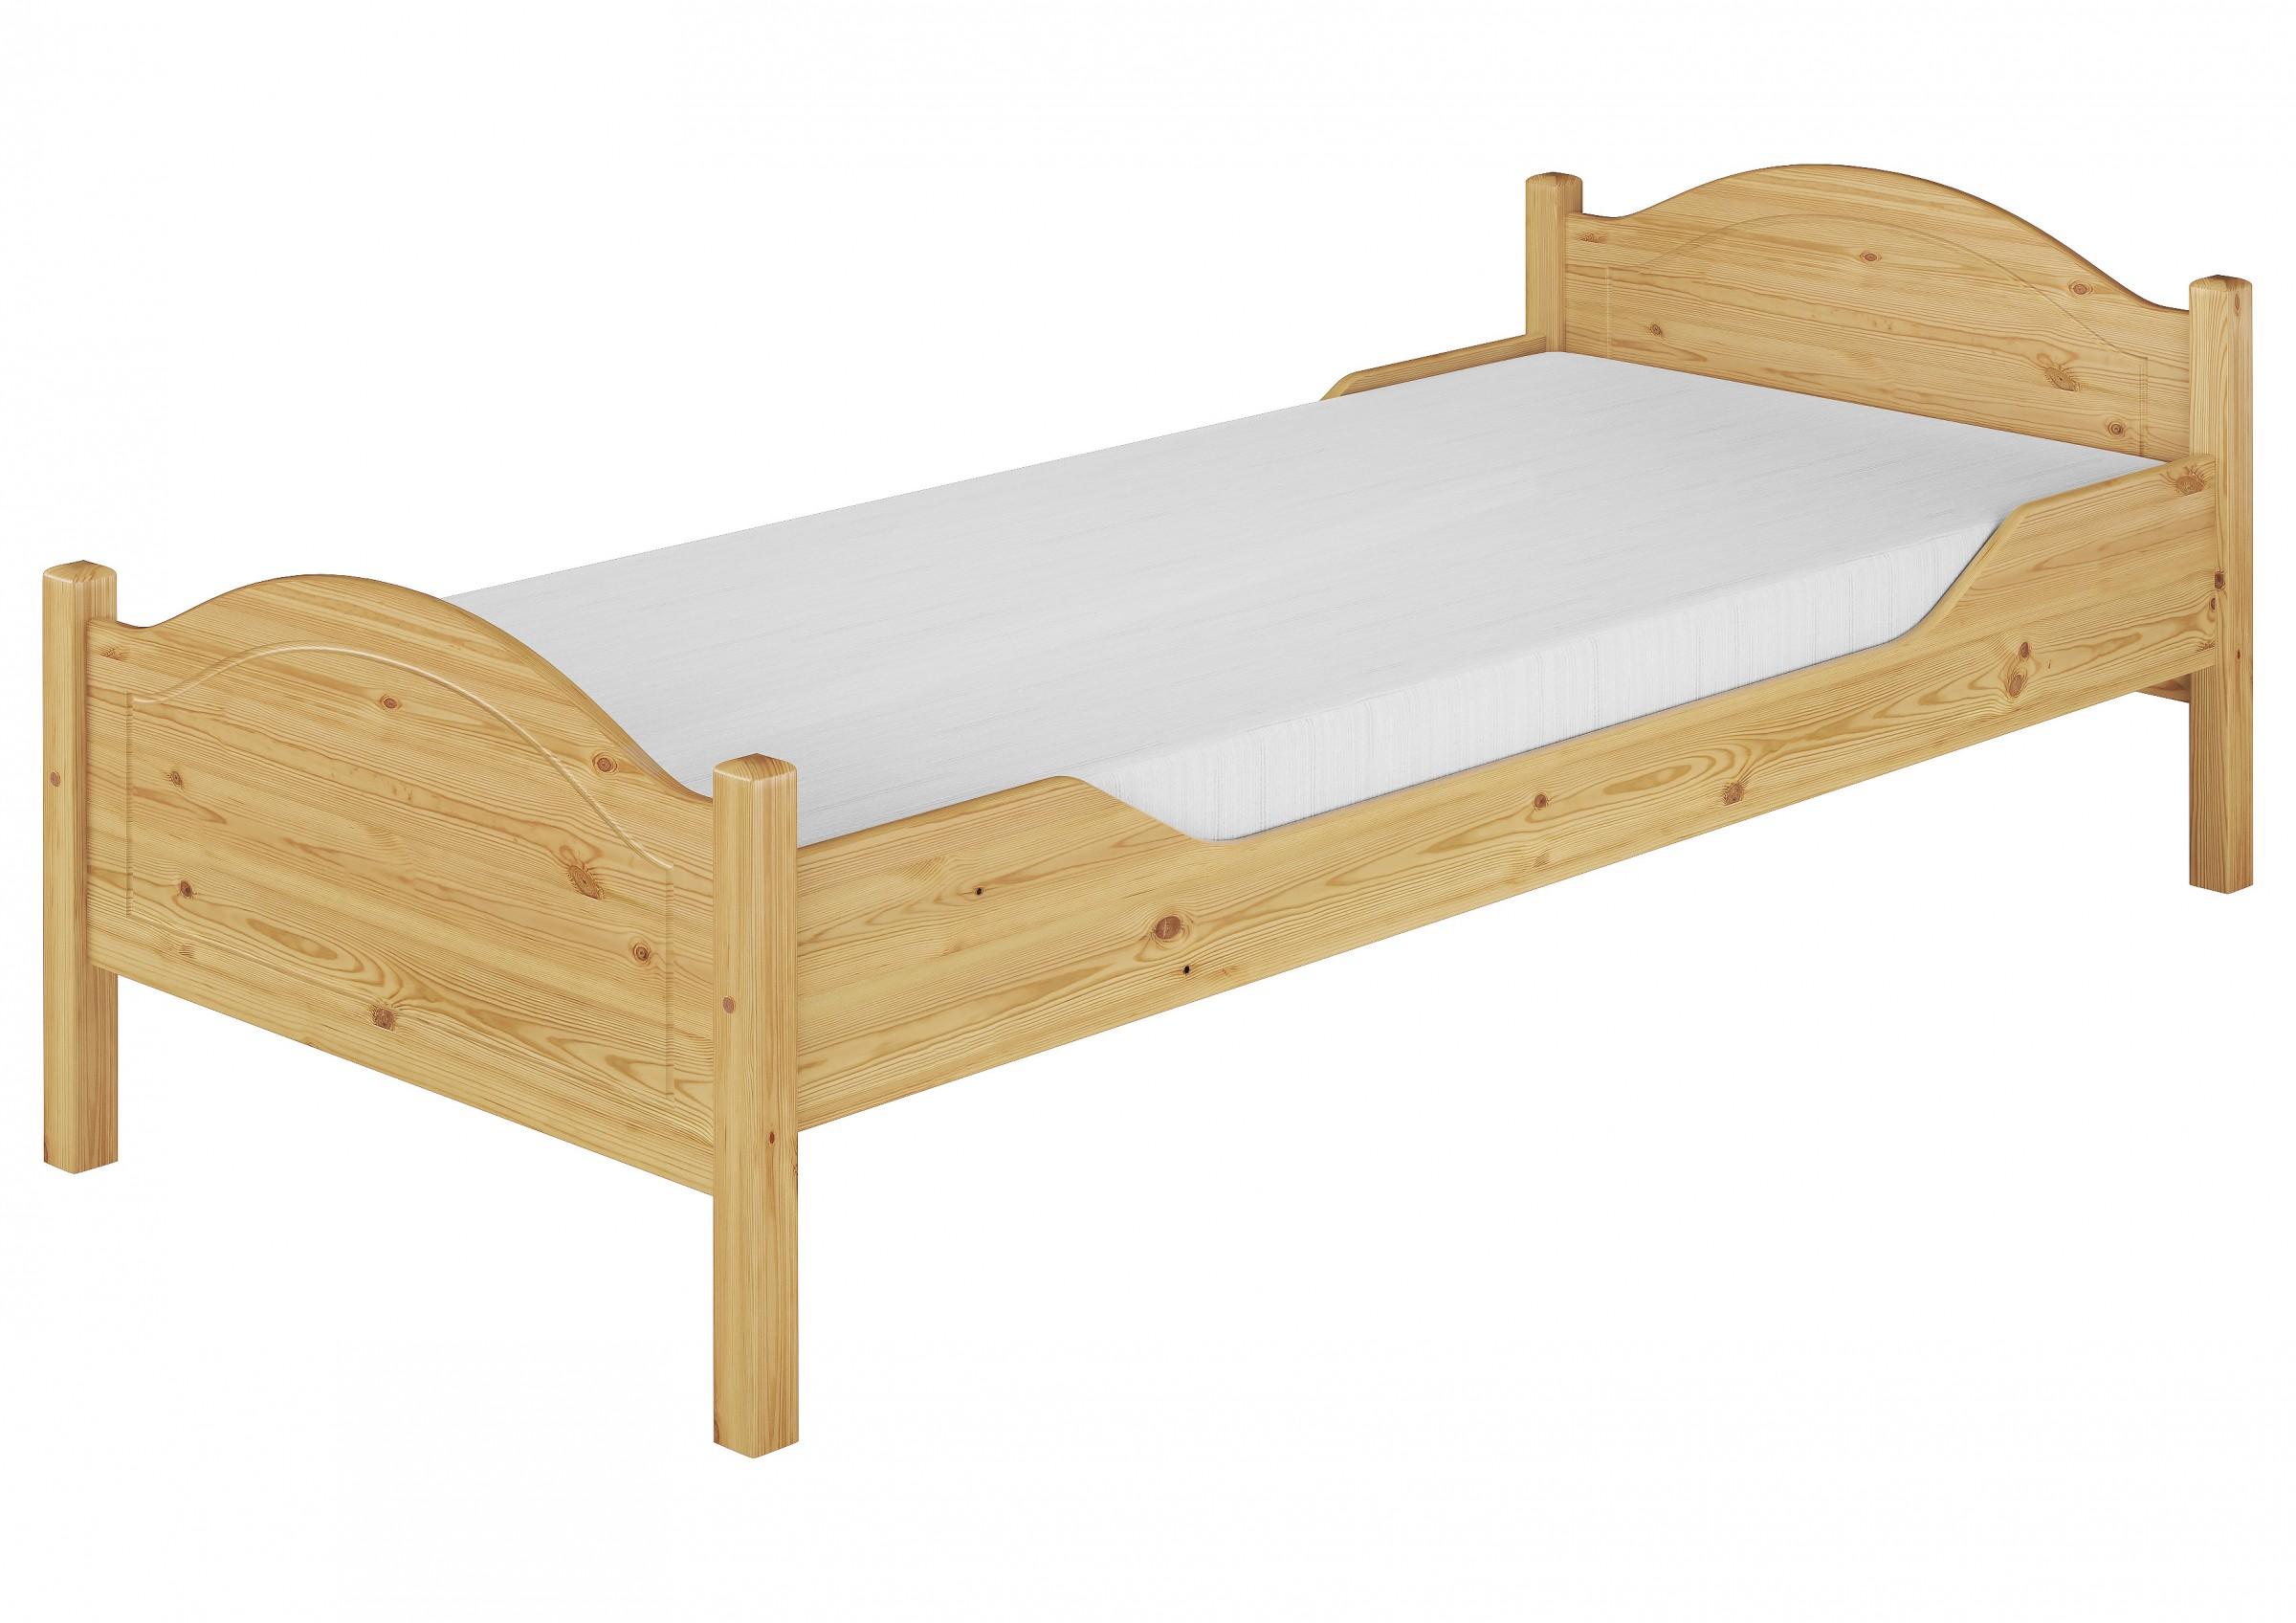 massivholz bett kiefer 100x200 einzelbett g stebett rollrost matratze m ebay. Black Bedroom Furniture Sets. Home Design Ideas